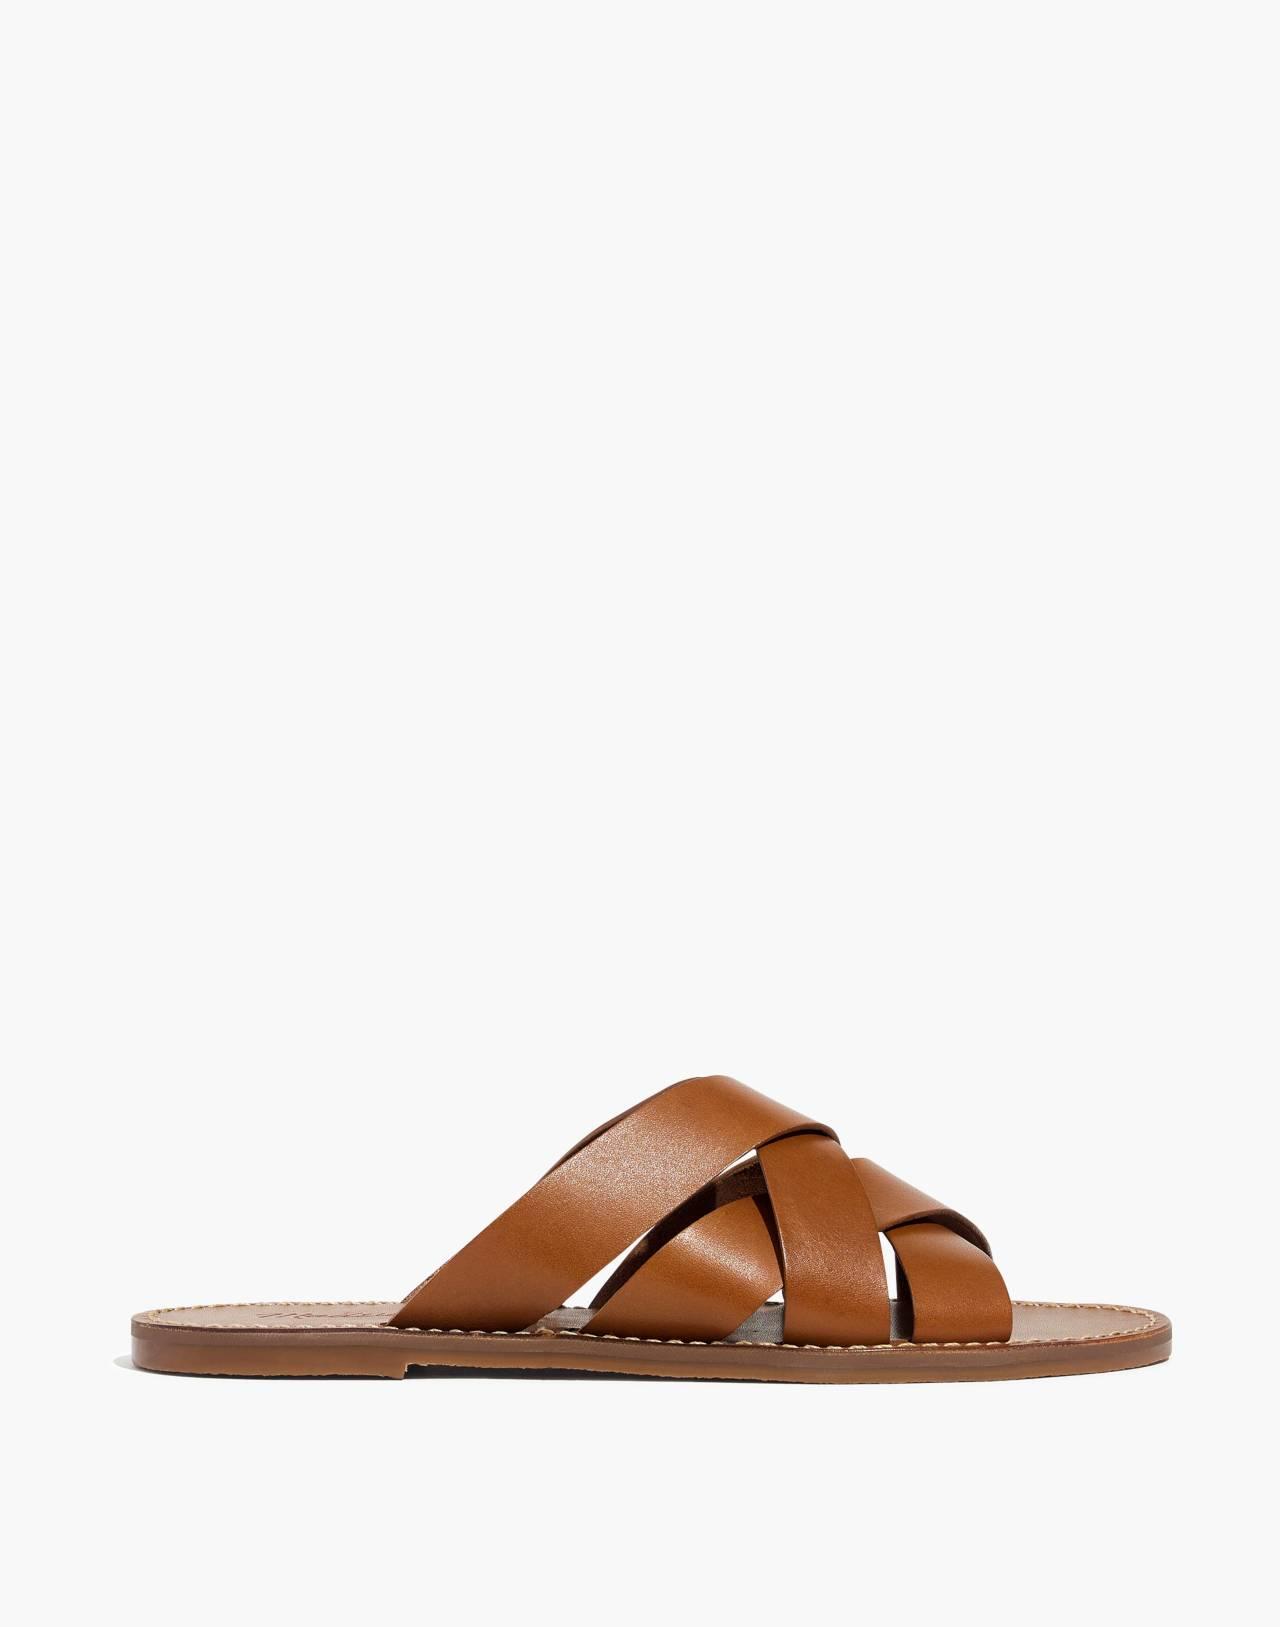 The Boardwalk Woven Slide Sandal in english saddle image 3